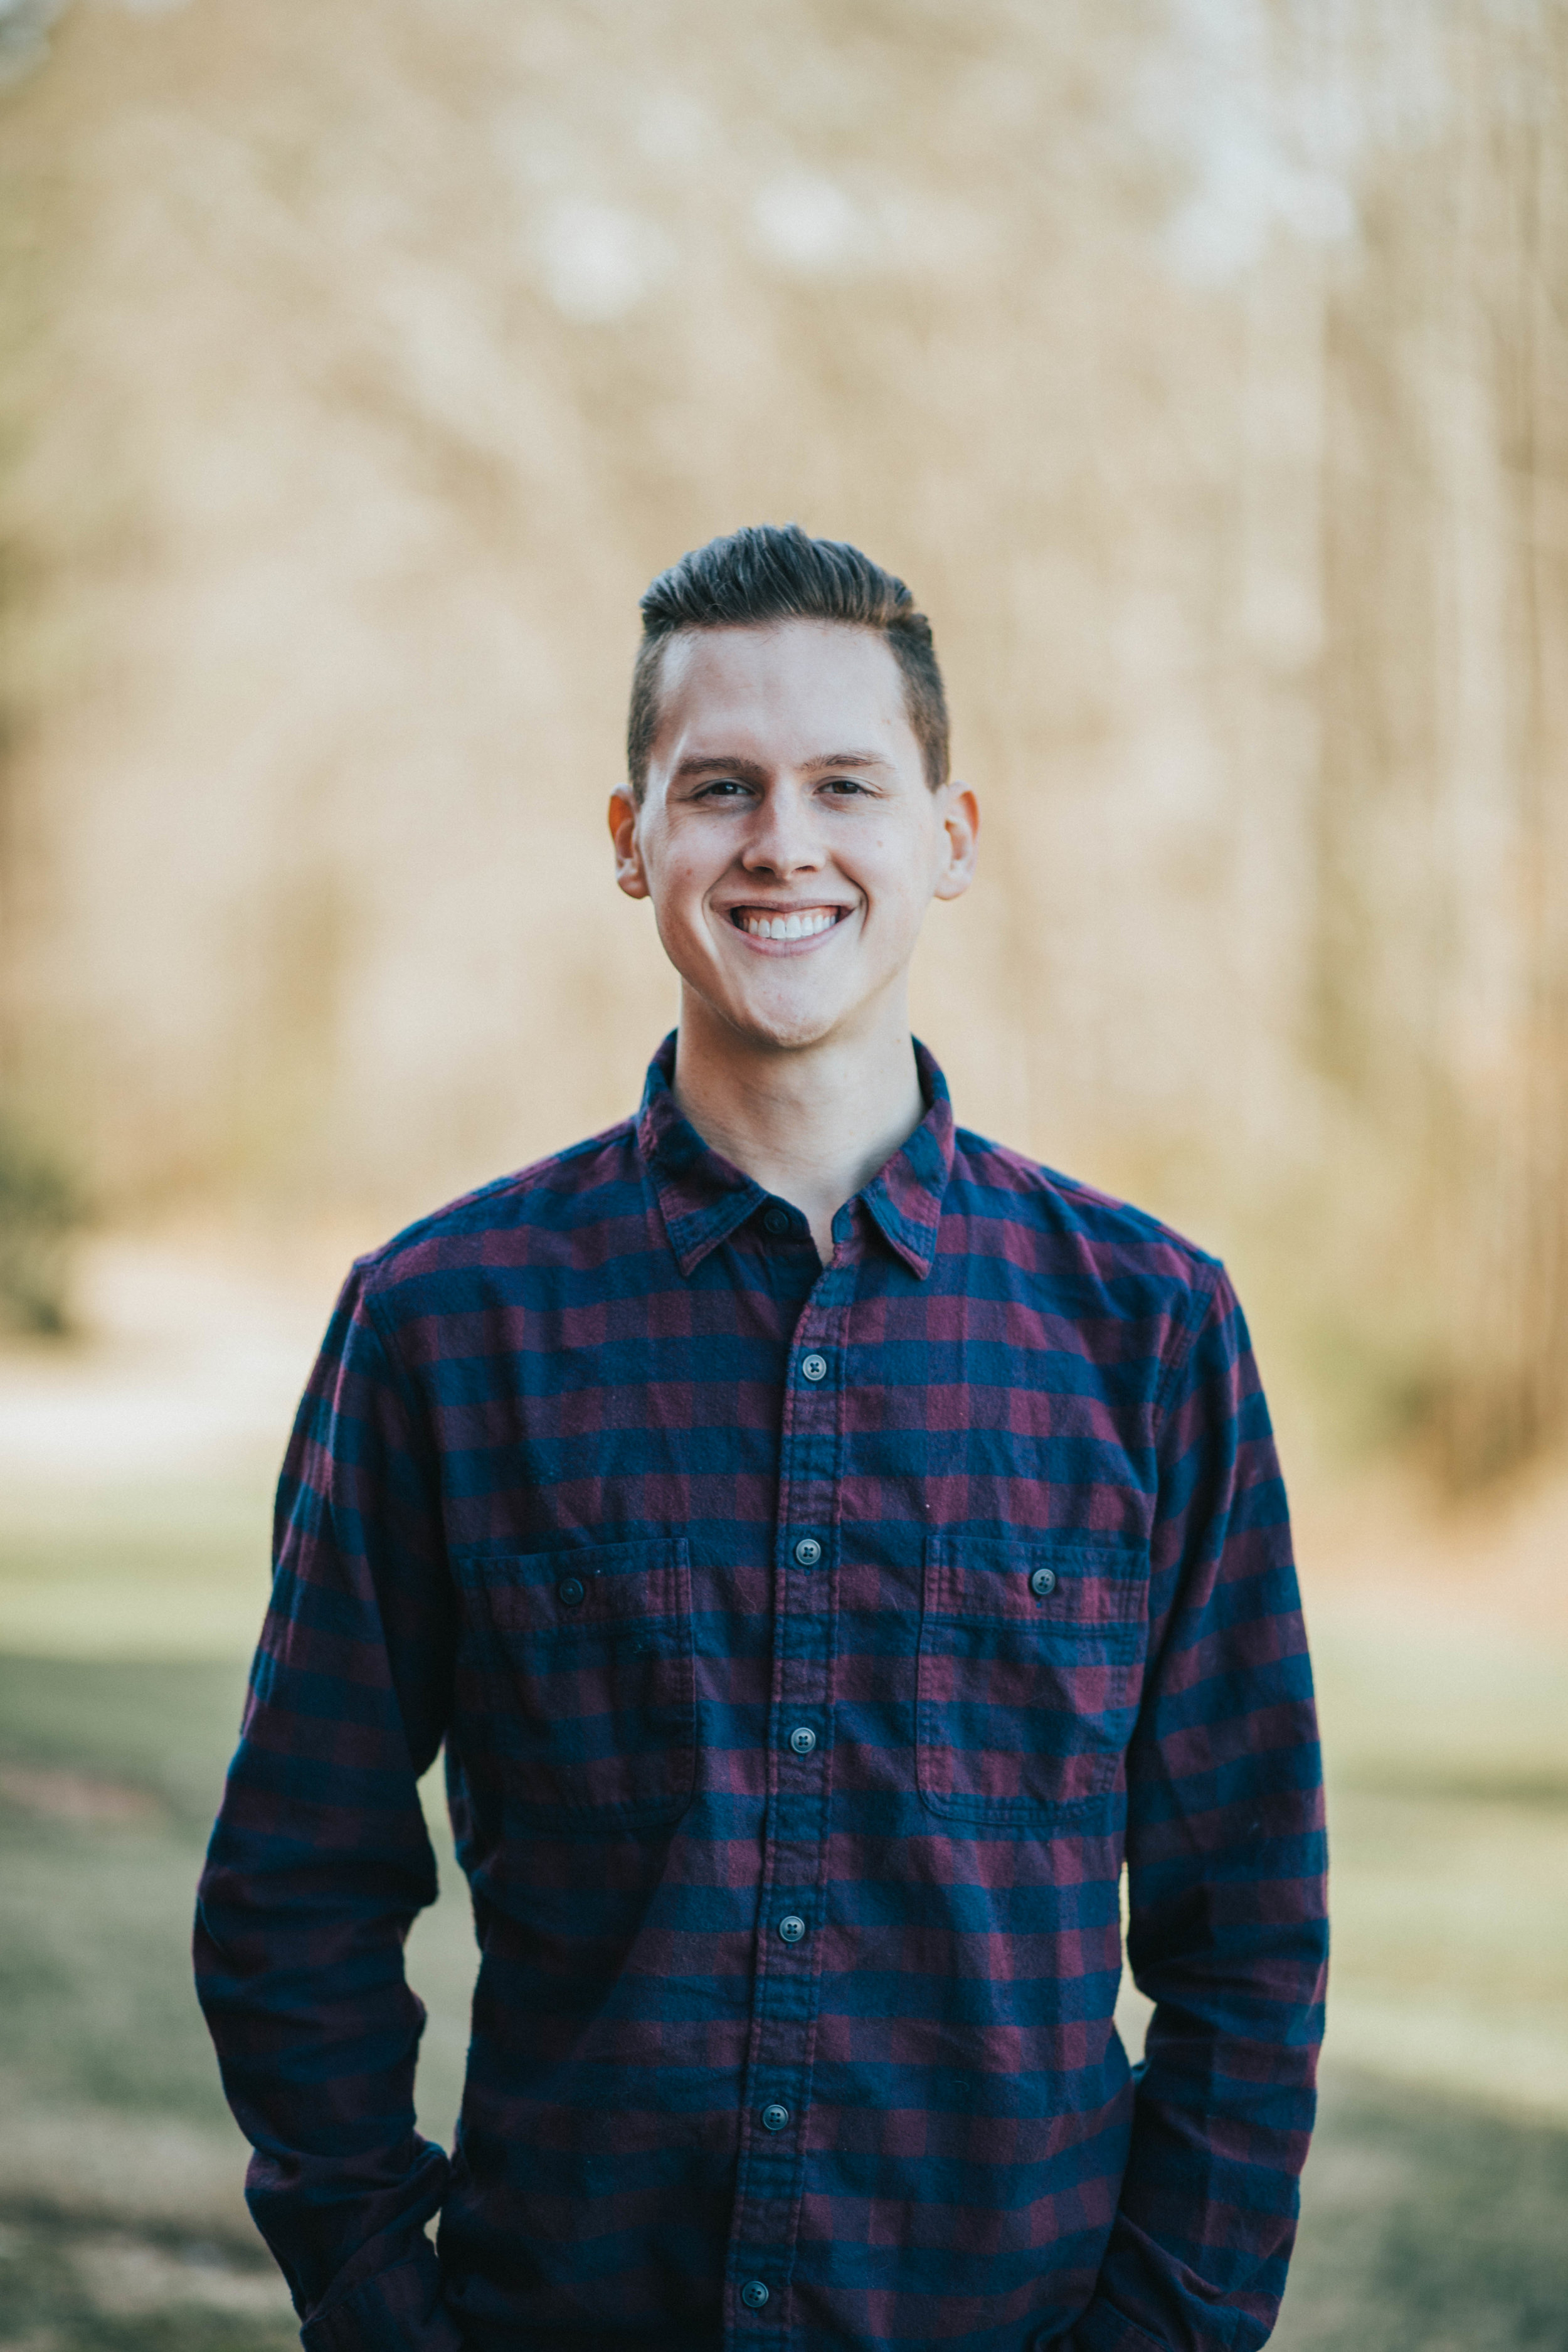 Weston Ogburn - Worship Leader    Email: westono@questfellowshipchurch.com